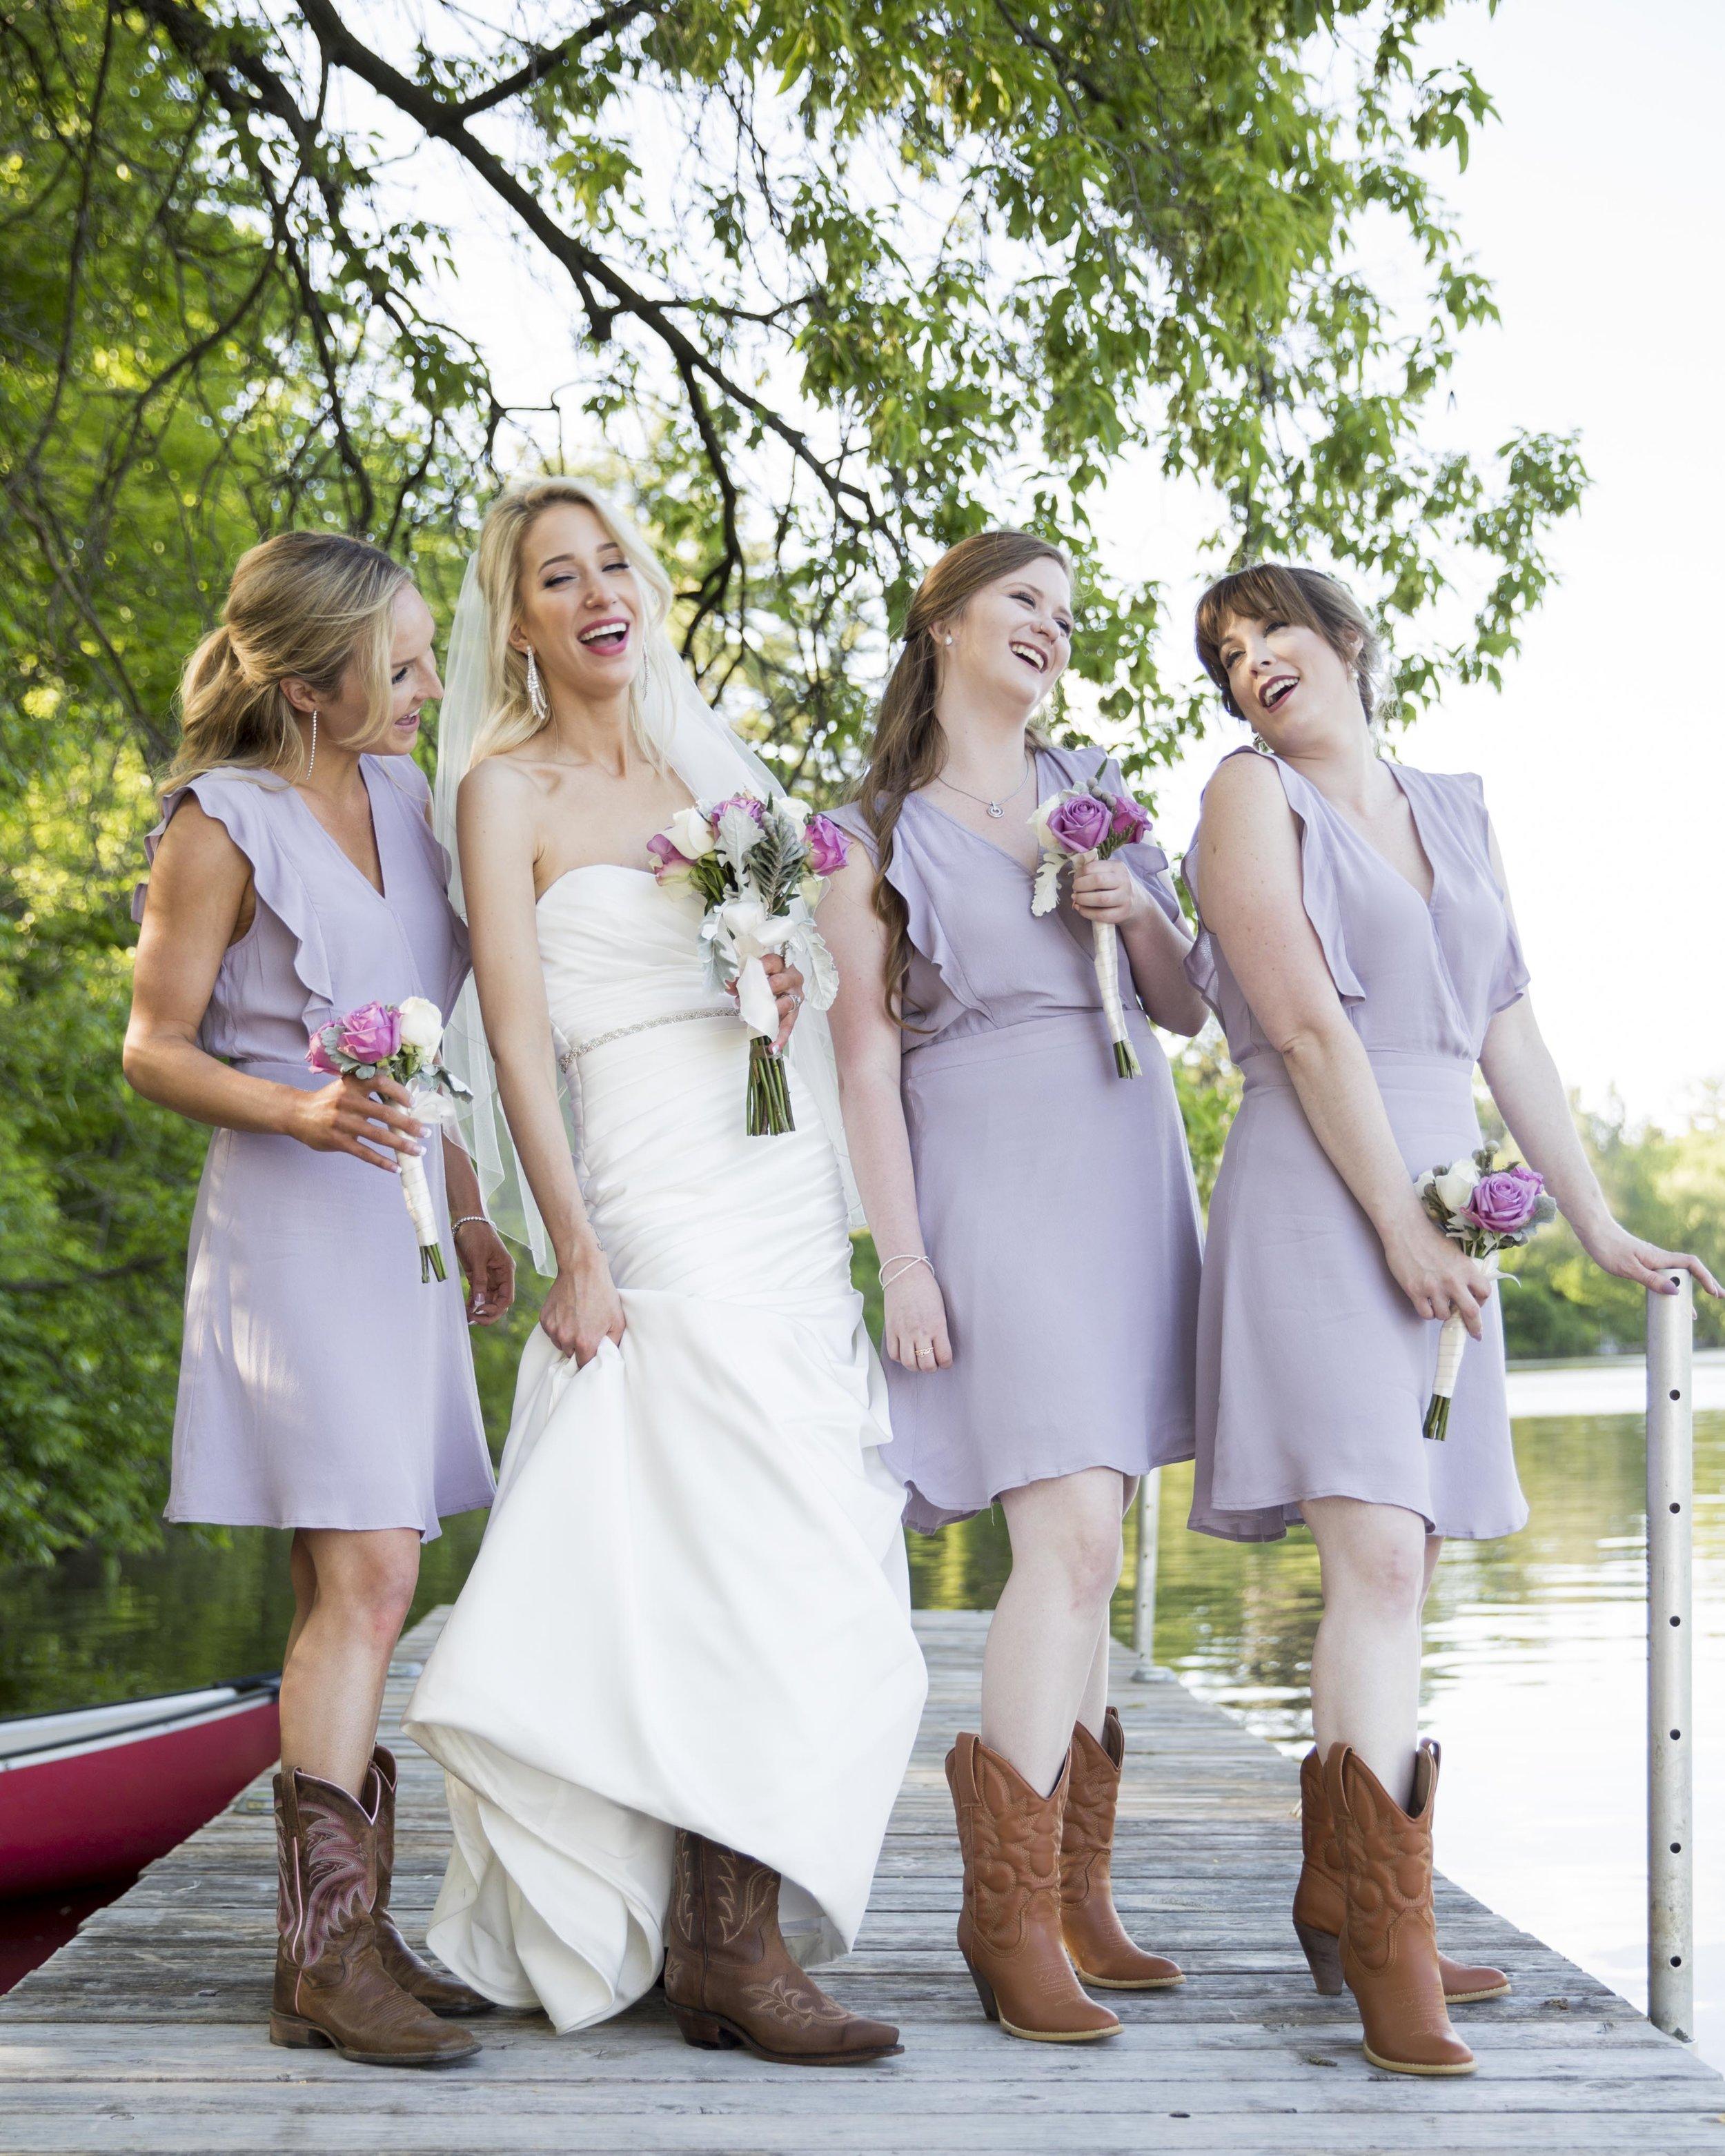 M&T Wedding 02.jpg